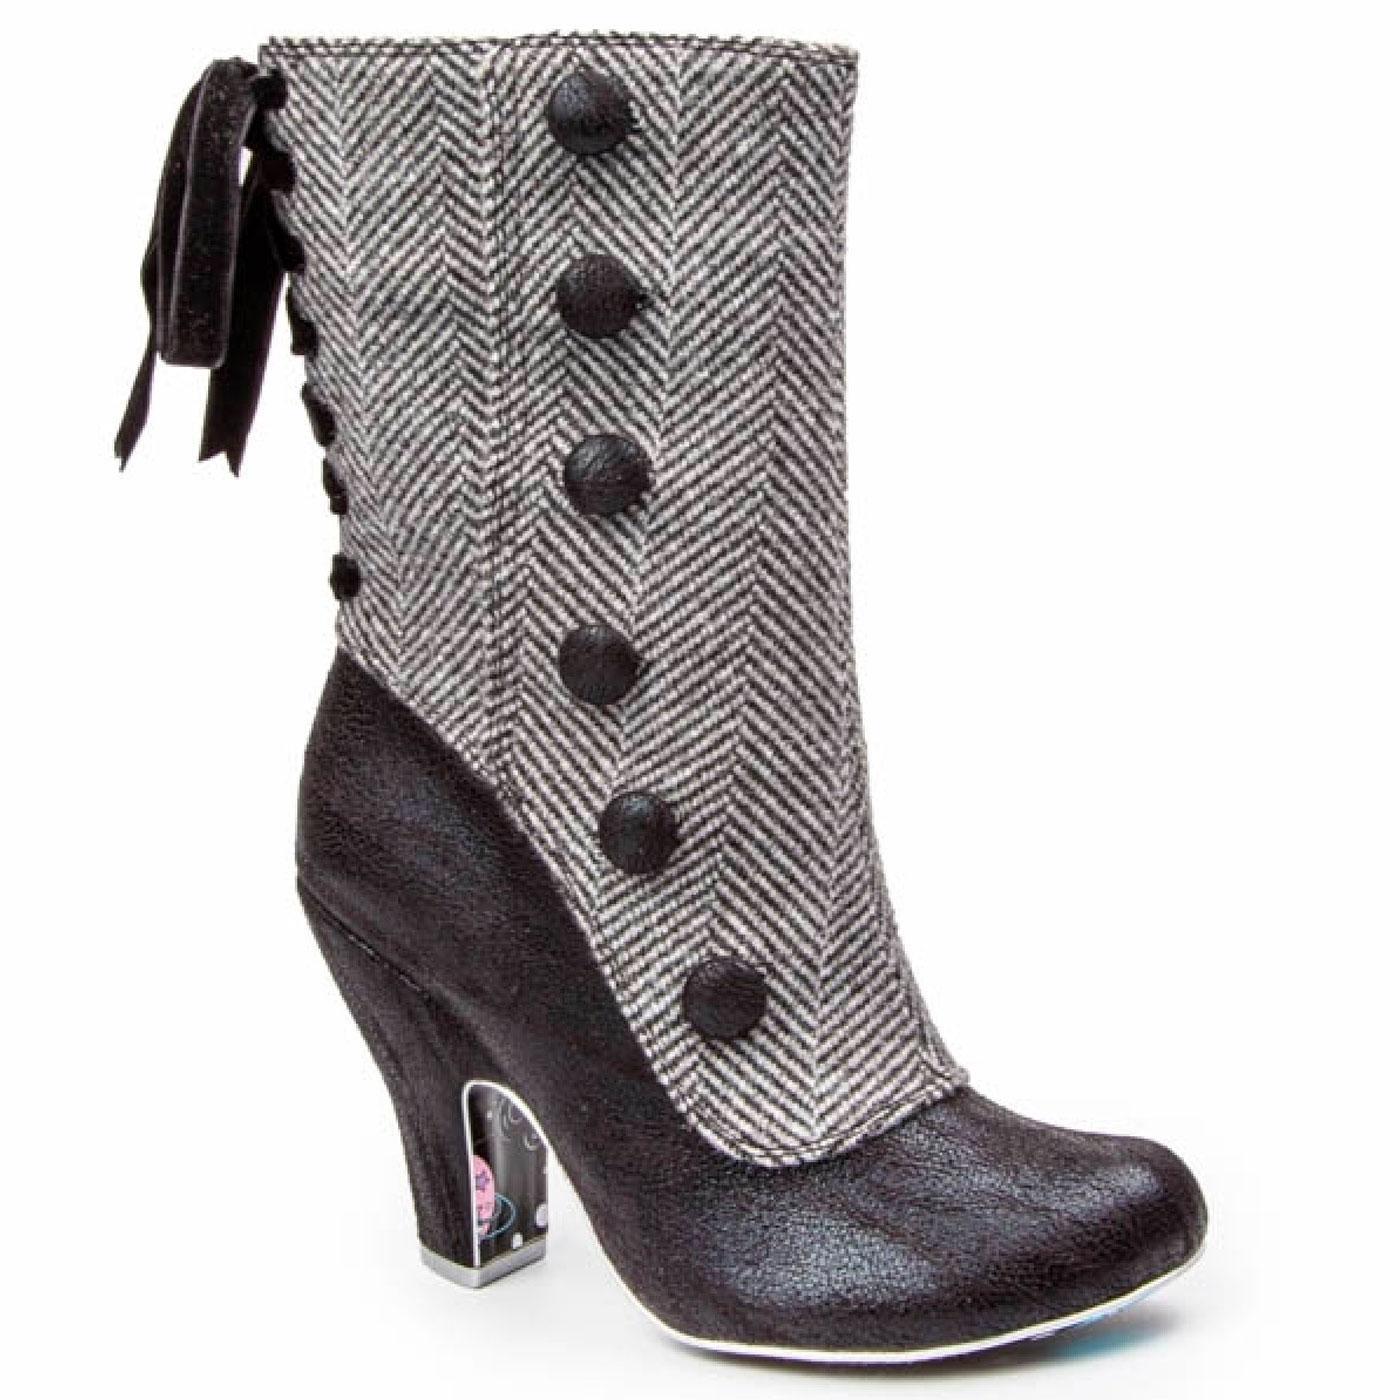 Reinette IRREGULAR CHOICE Vintage Mid Calf Boots